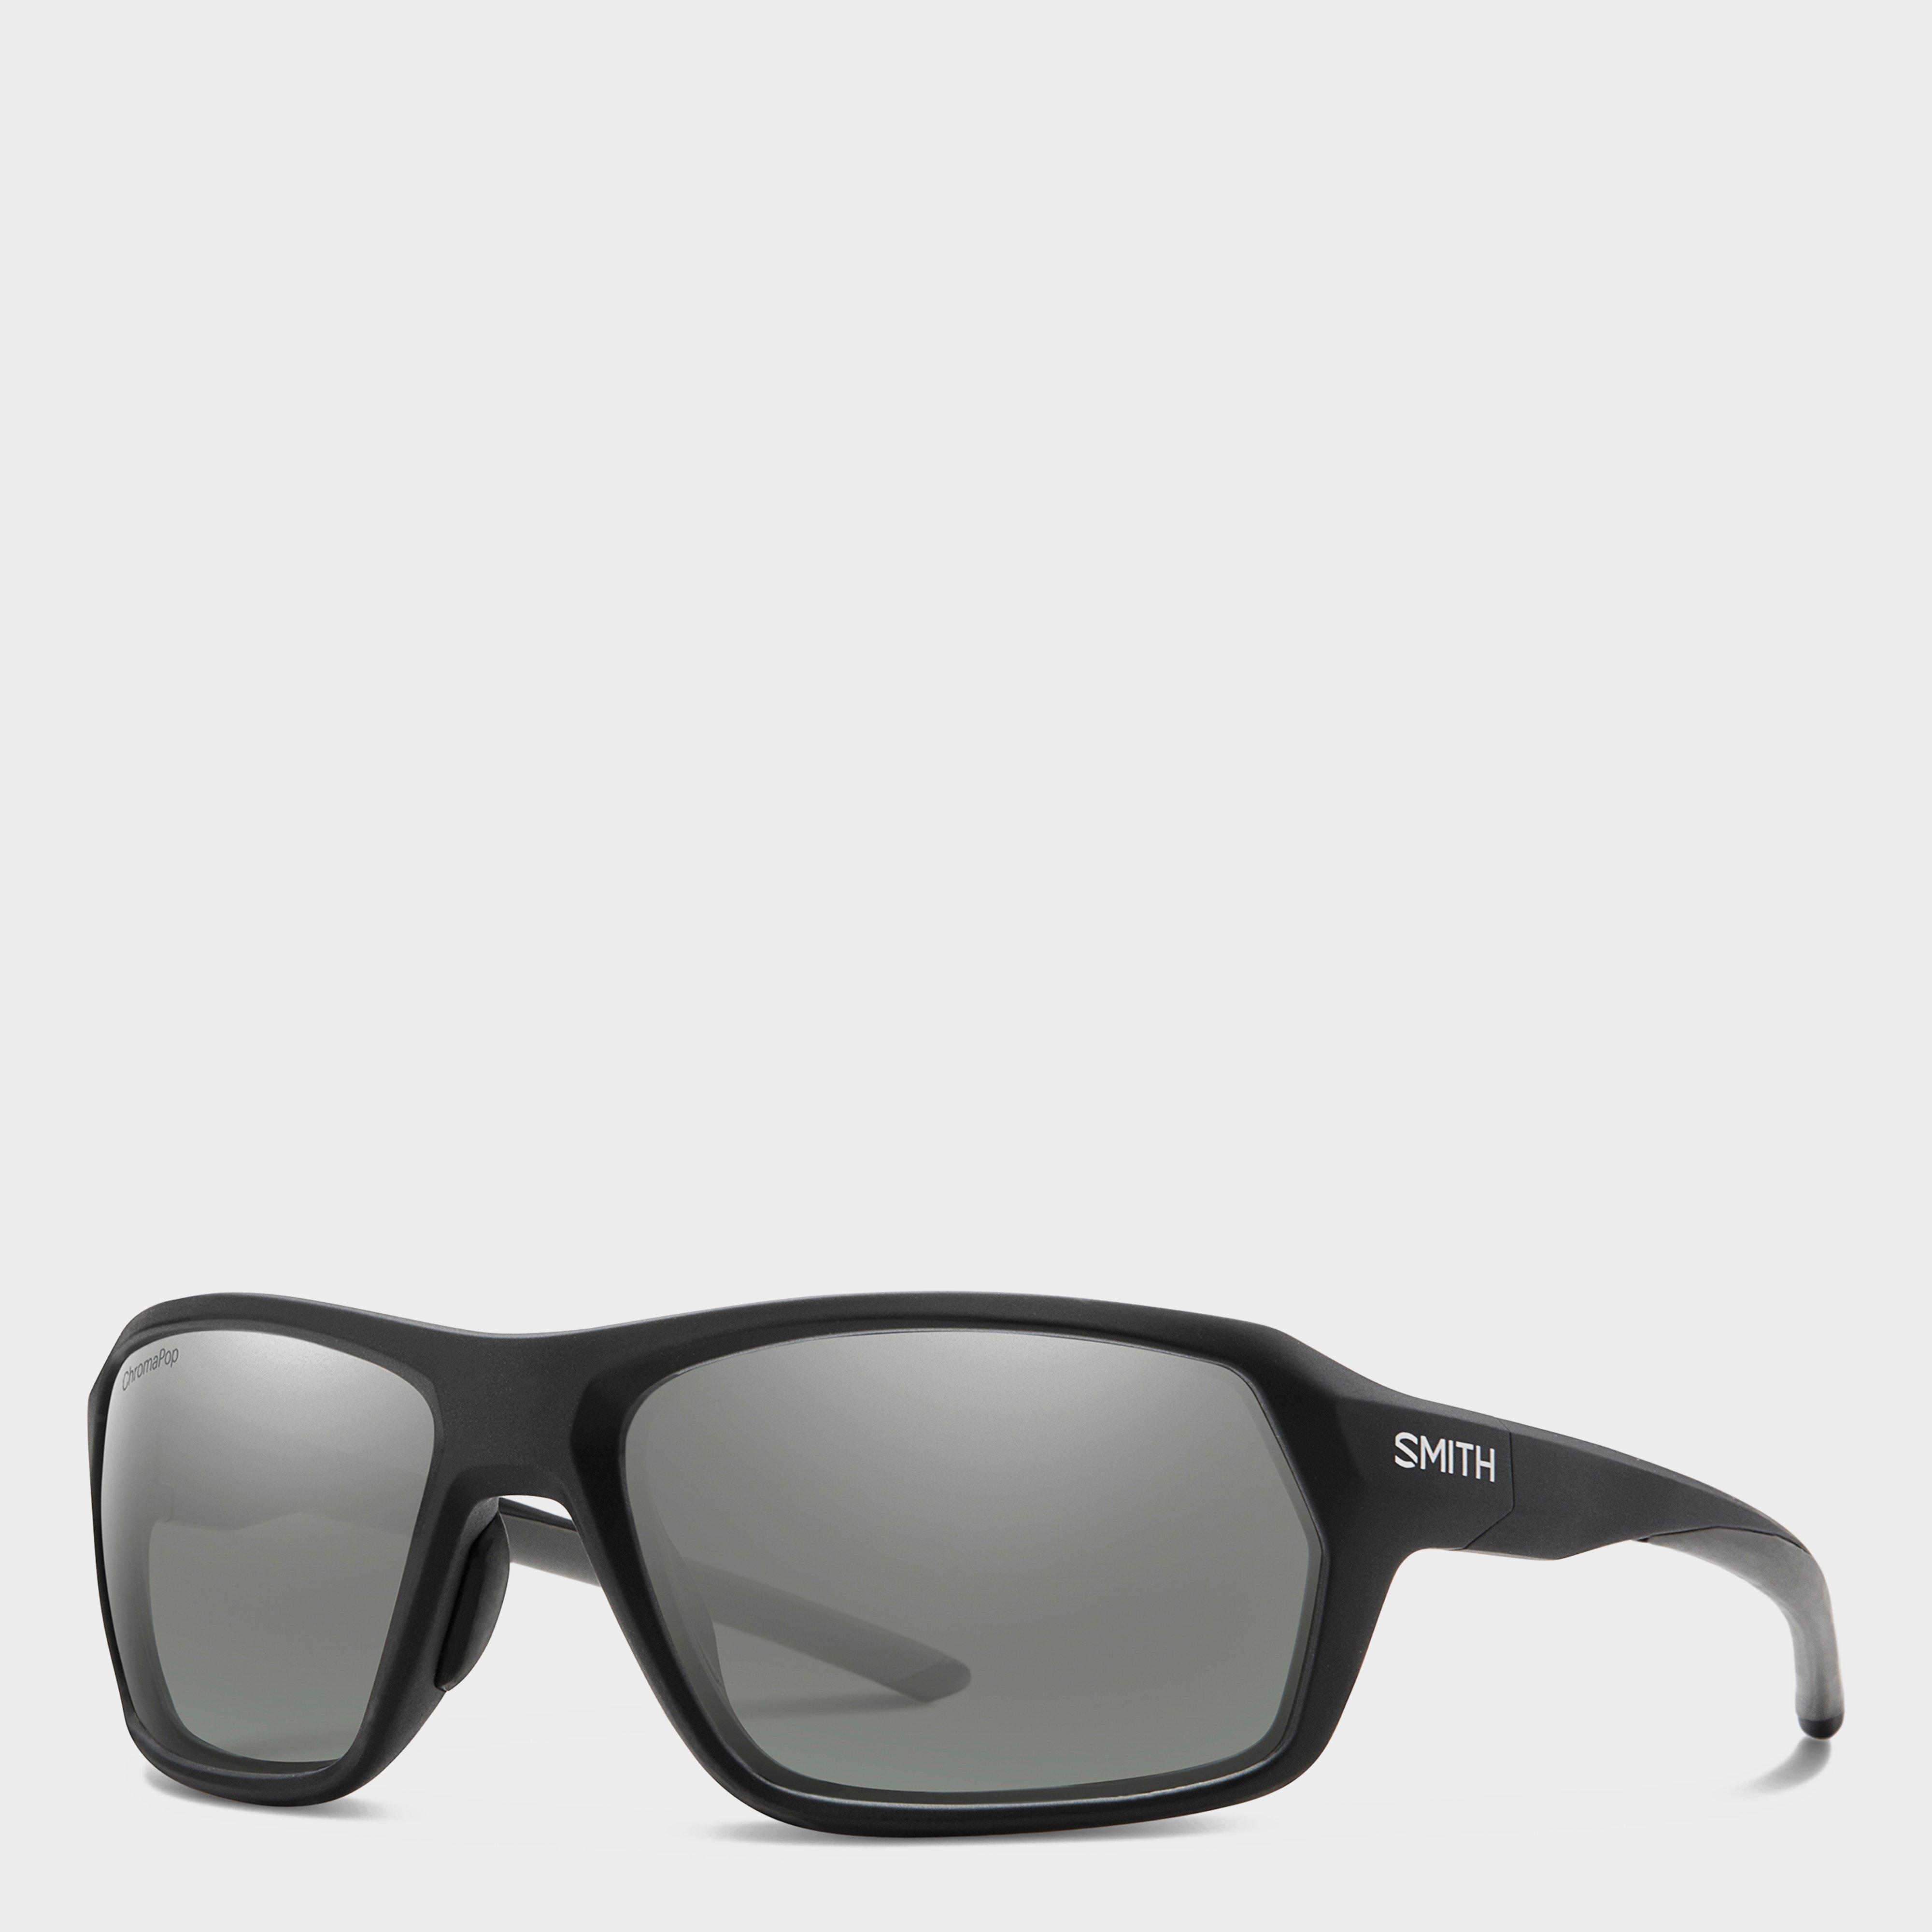 Smith Rebound Sunglasses, Black